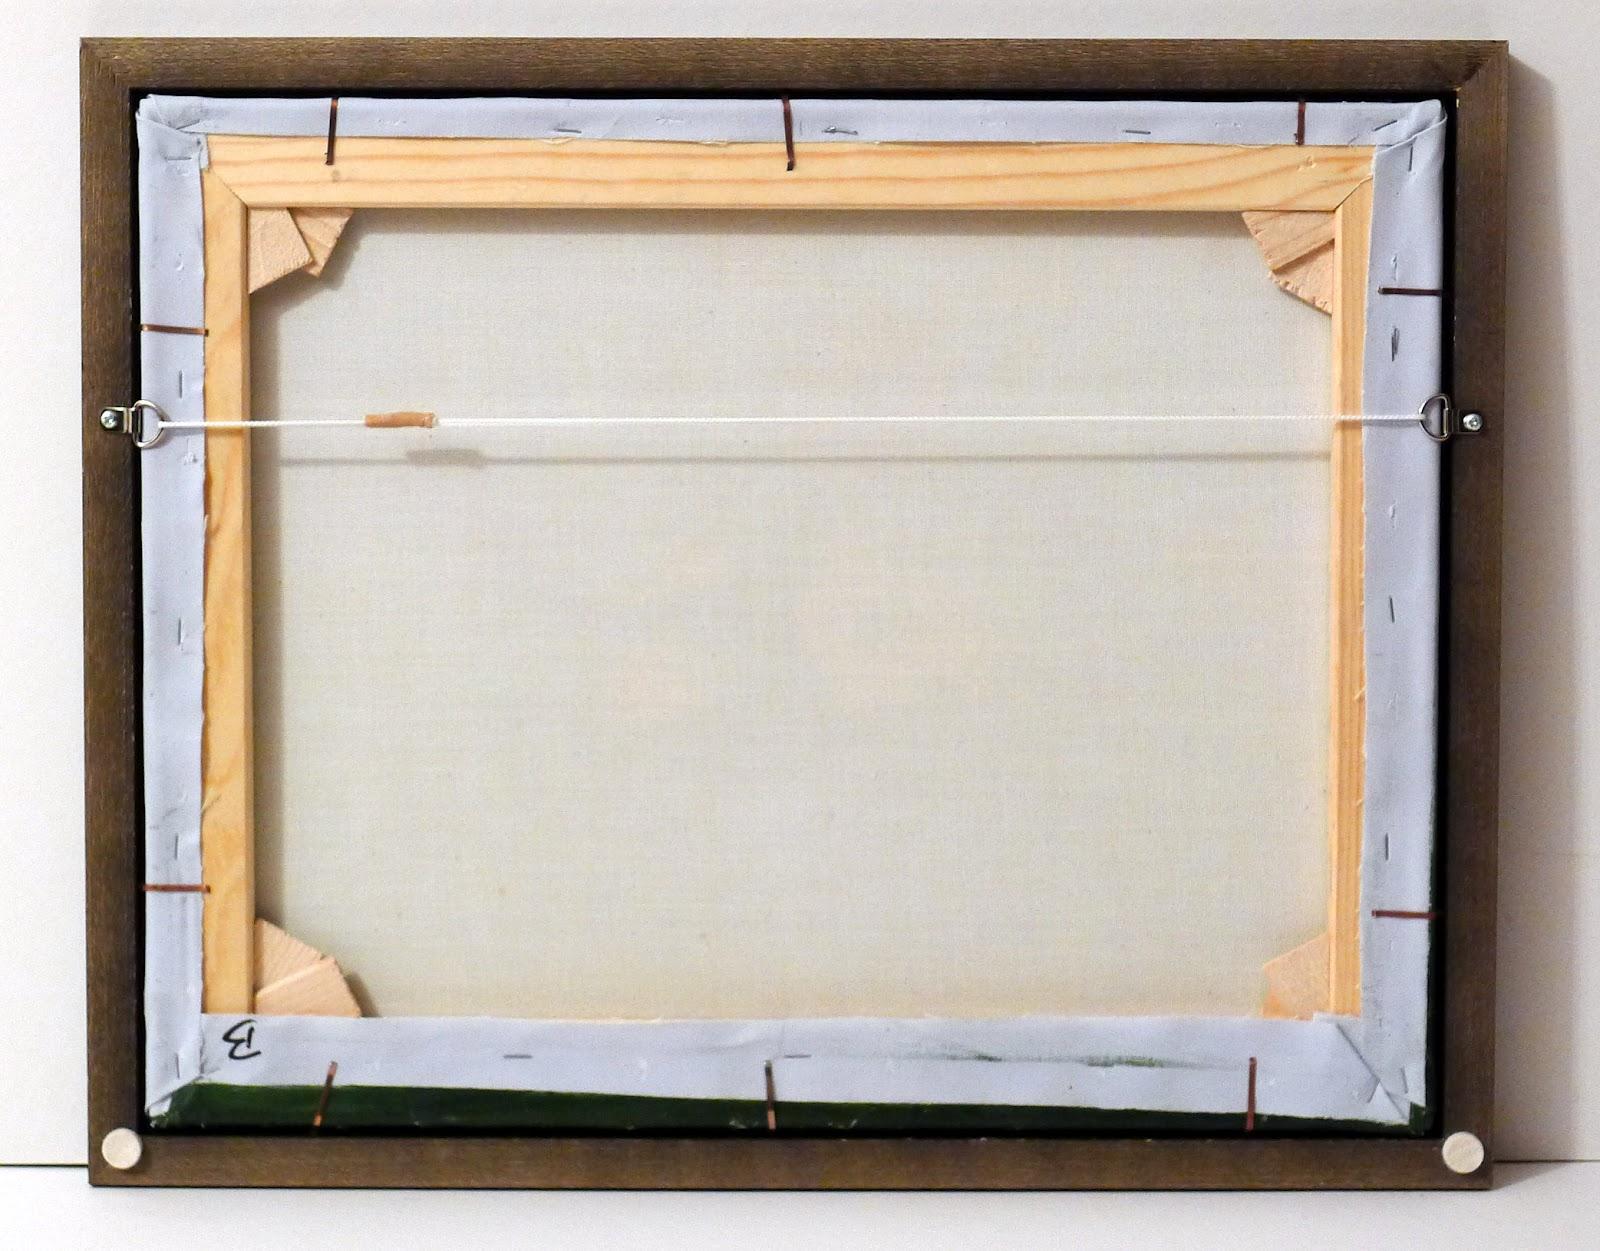 Needlework Framing Course | The Framing Lady